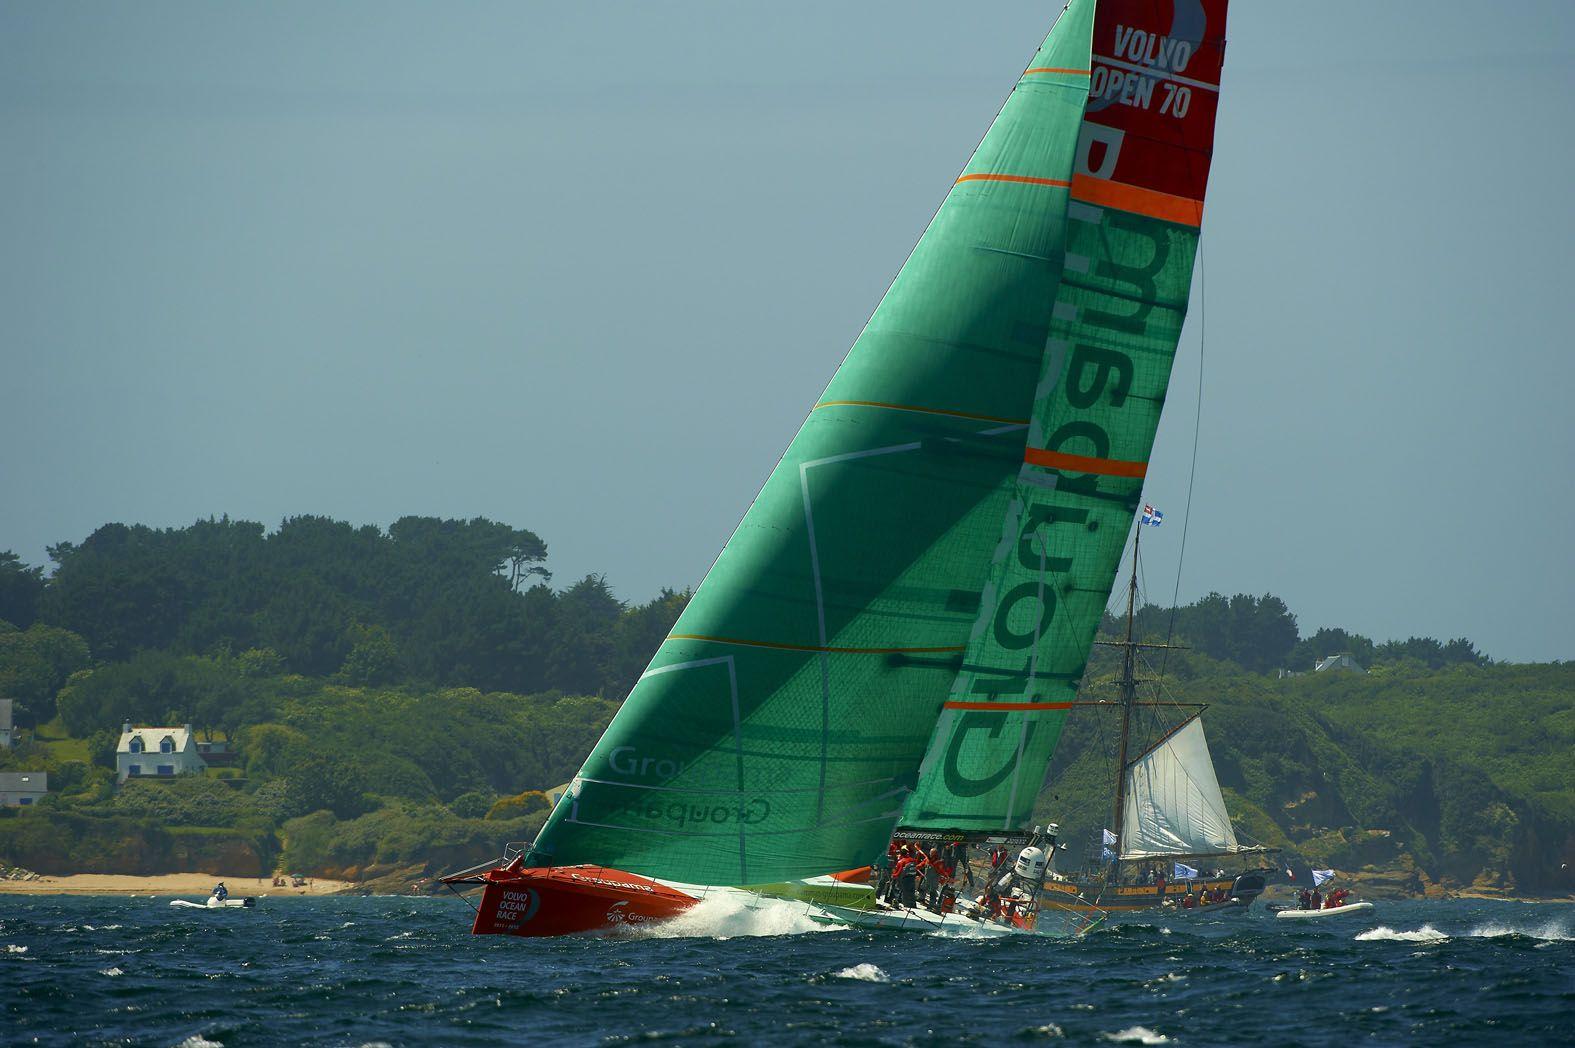 ProAm in Lorient / Credits Yvan Zedda